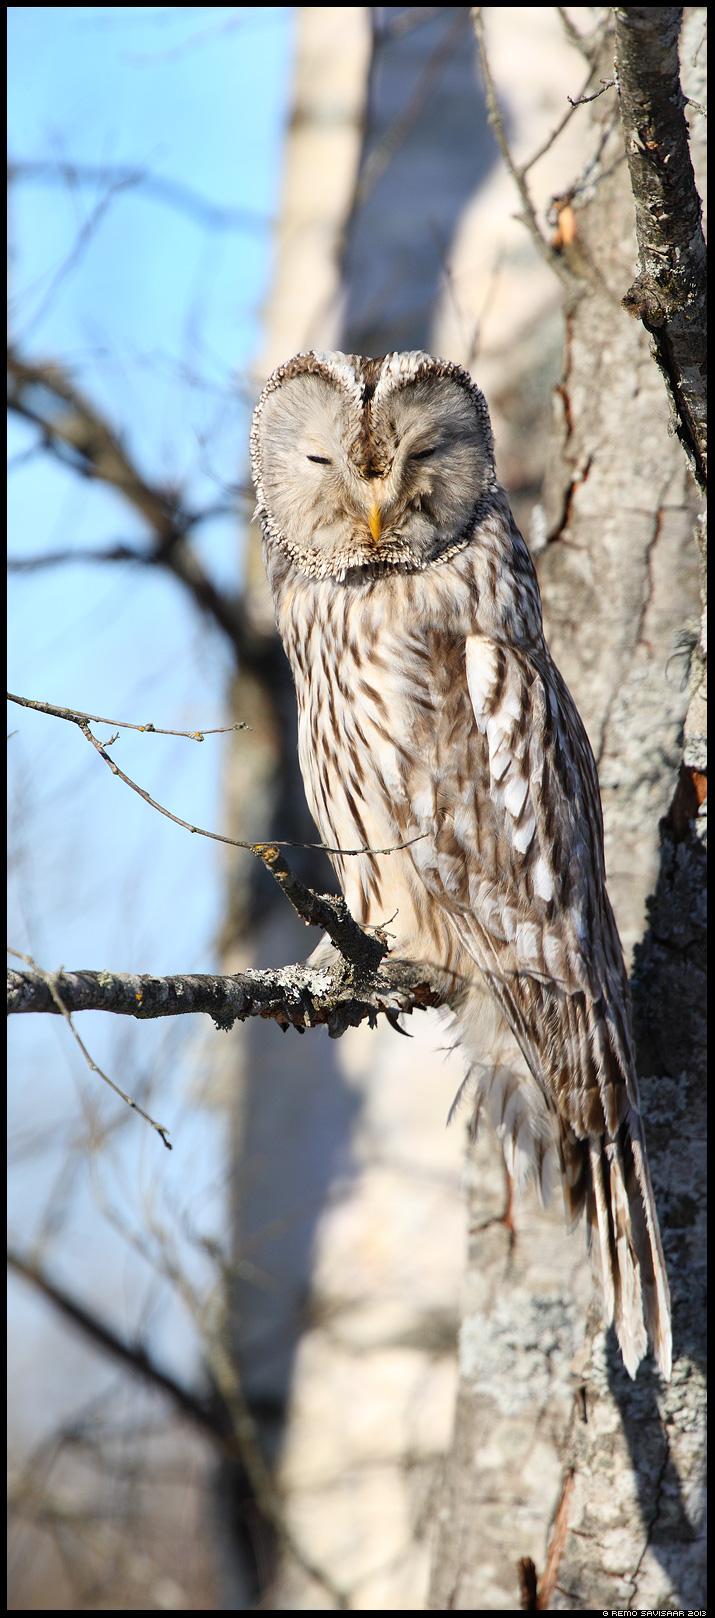 Händkakk, Ural Owl, Strix uralensis portree portrait Remo Savisaar Eesti loodus Estonian Estonia Baltic nature wildlife photography photo blog loodusfotod loodusfoto looduspilt looduspildid